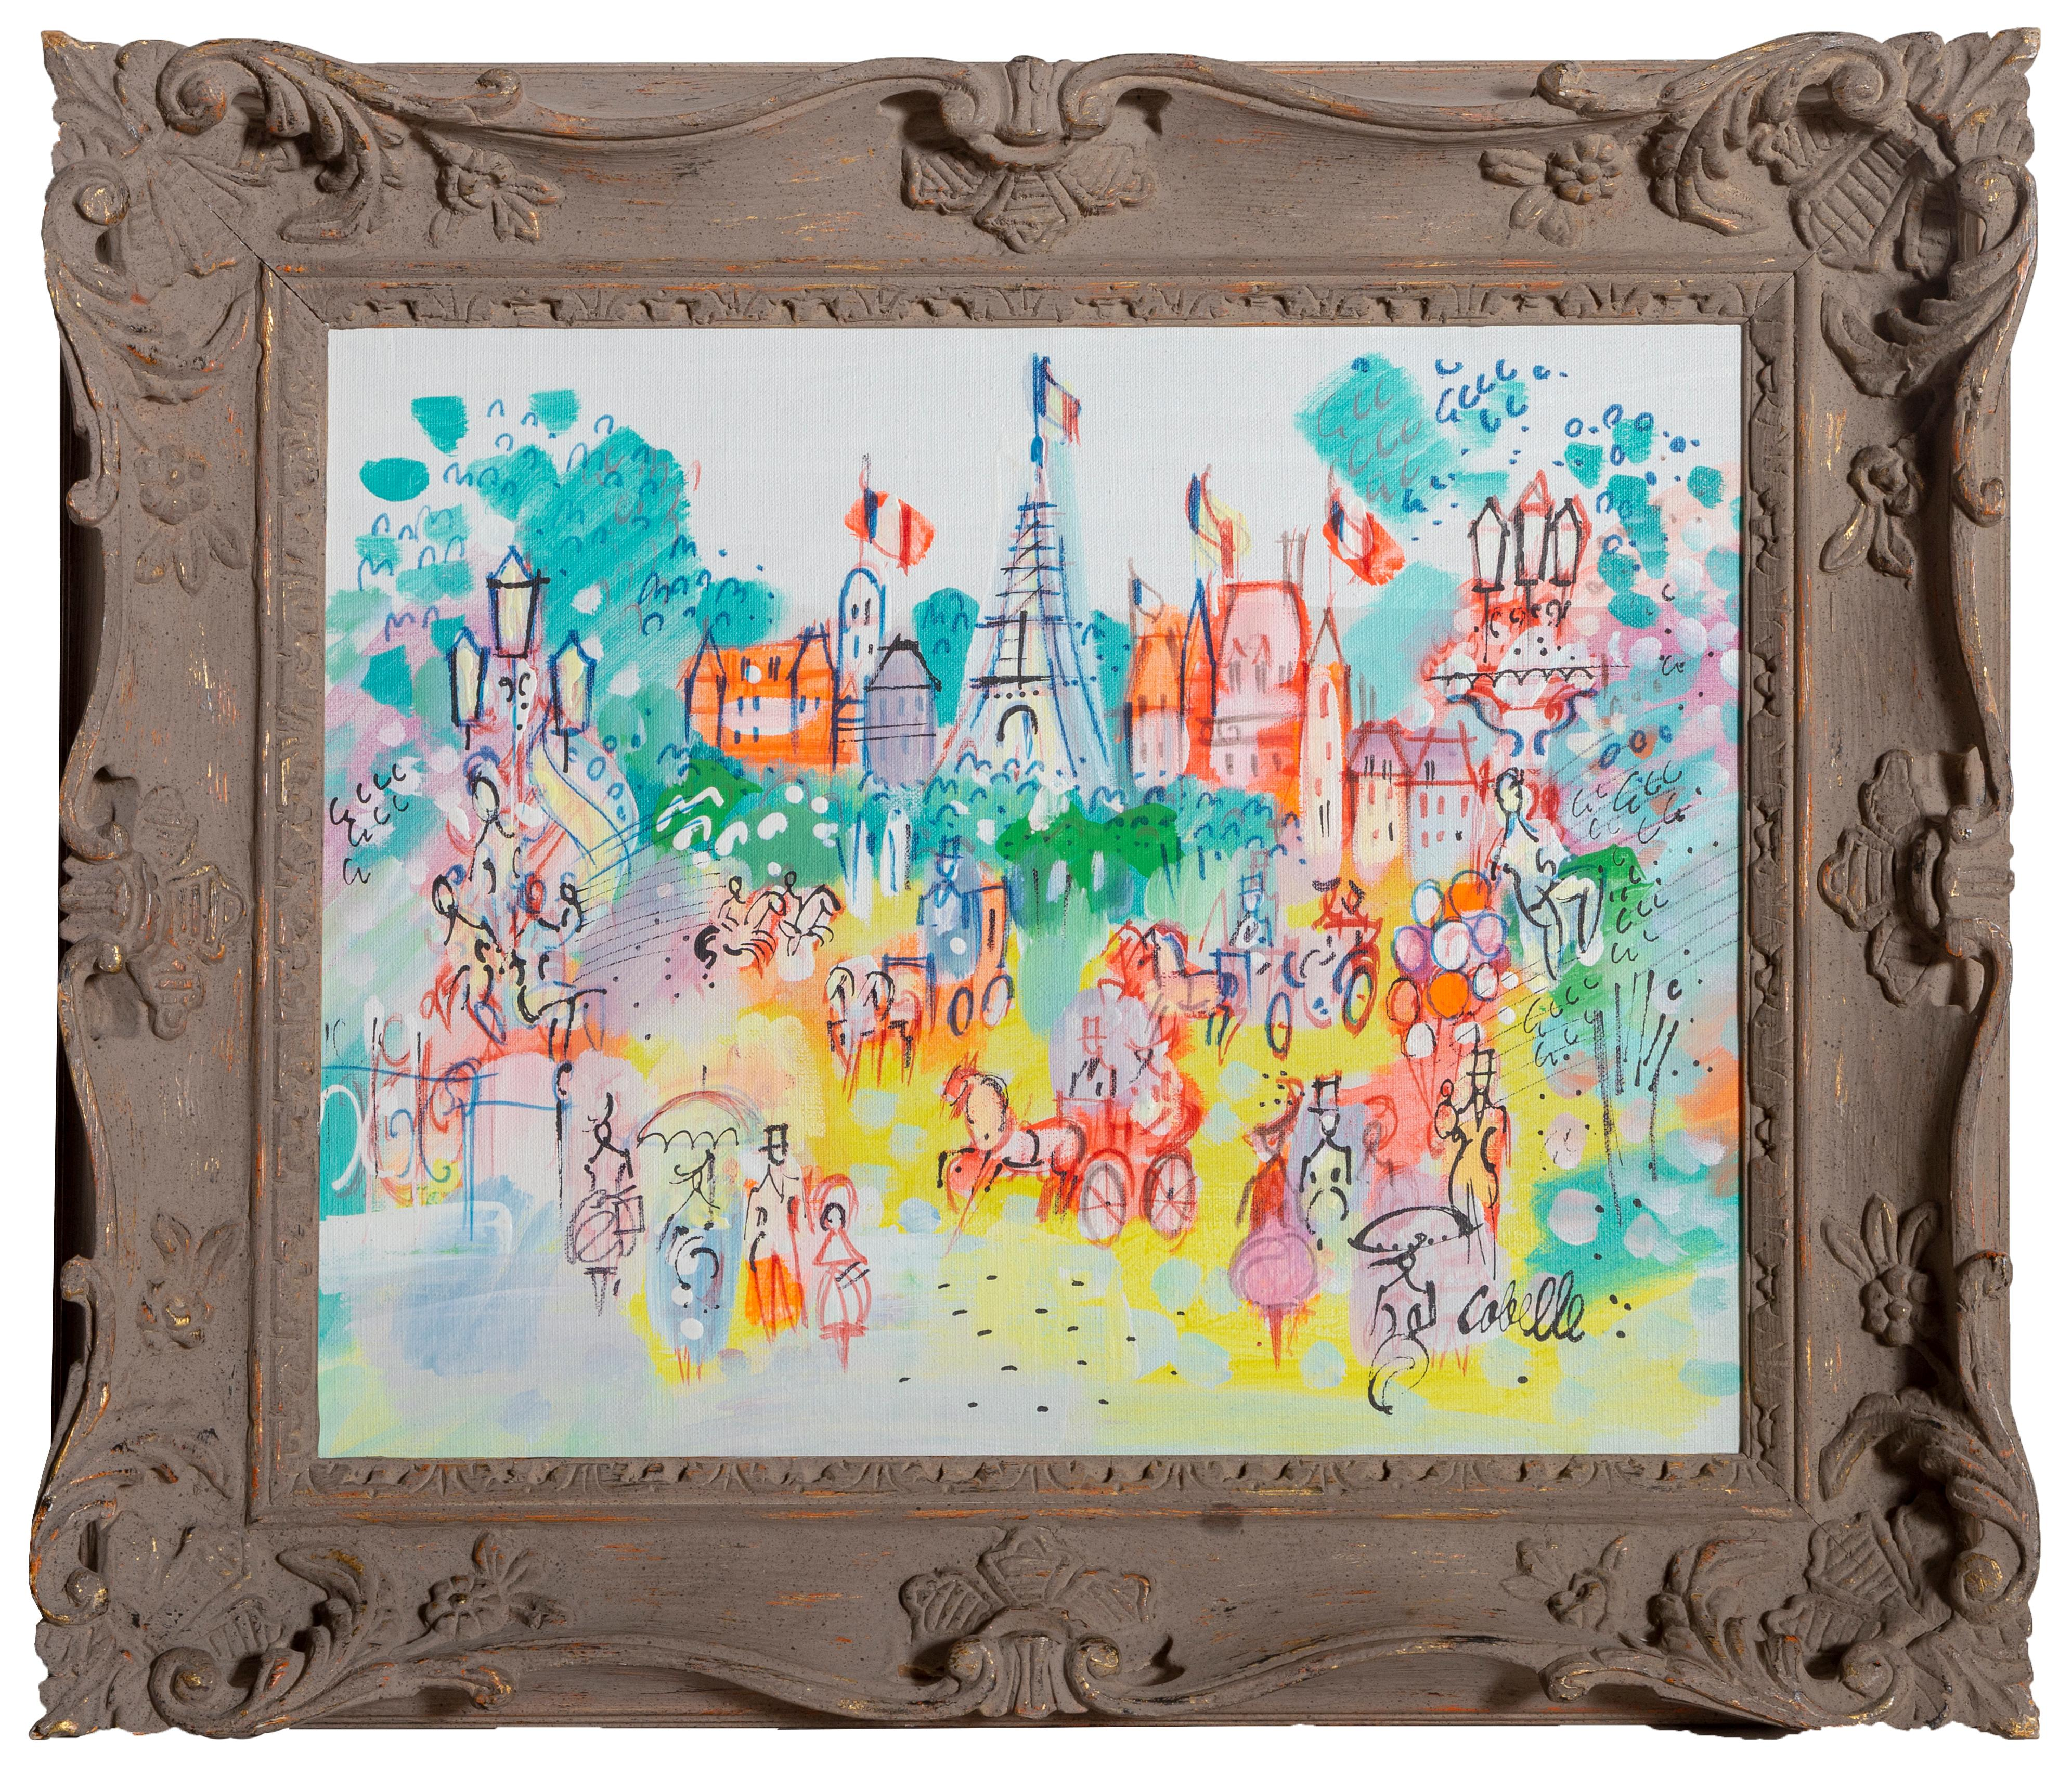 Eiffel Tower Plaza, Parisian Cityscape Painting